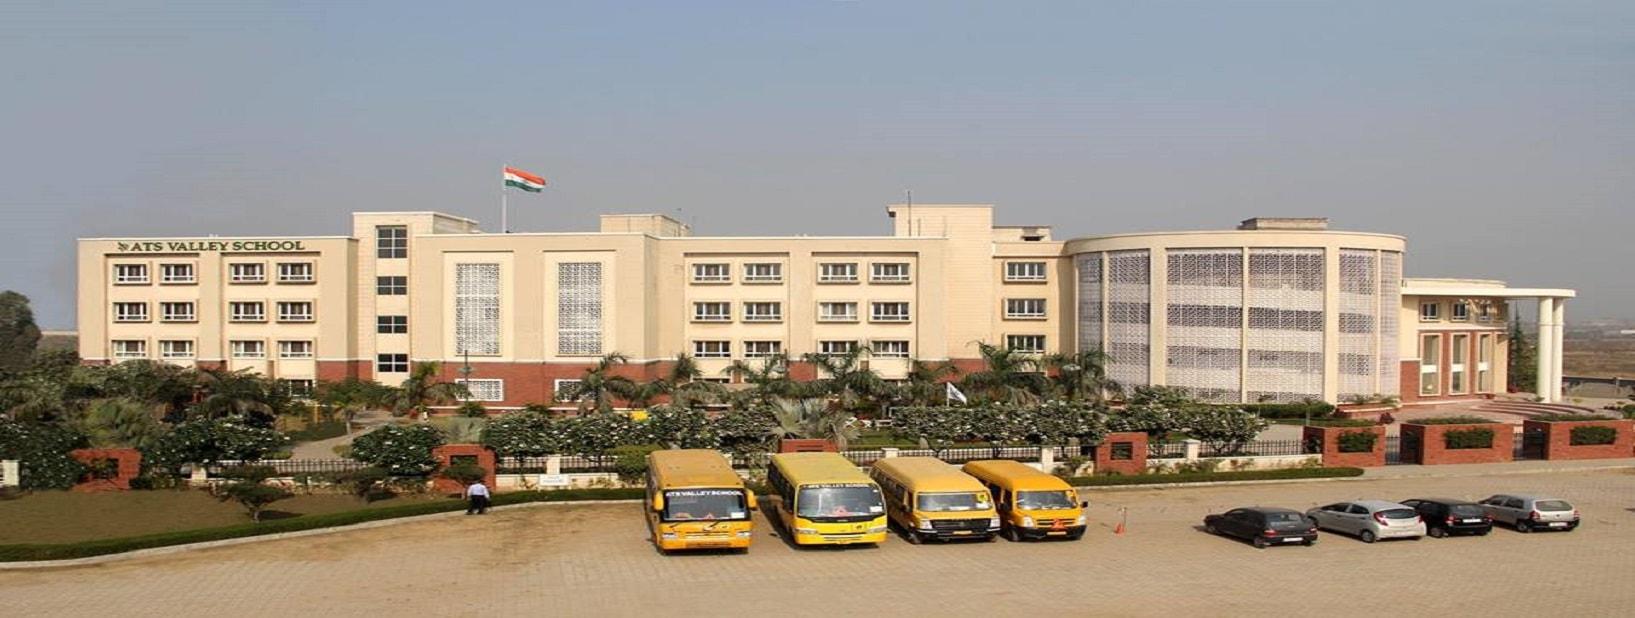 ATS Valley School